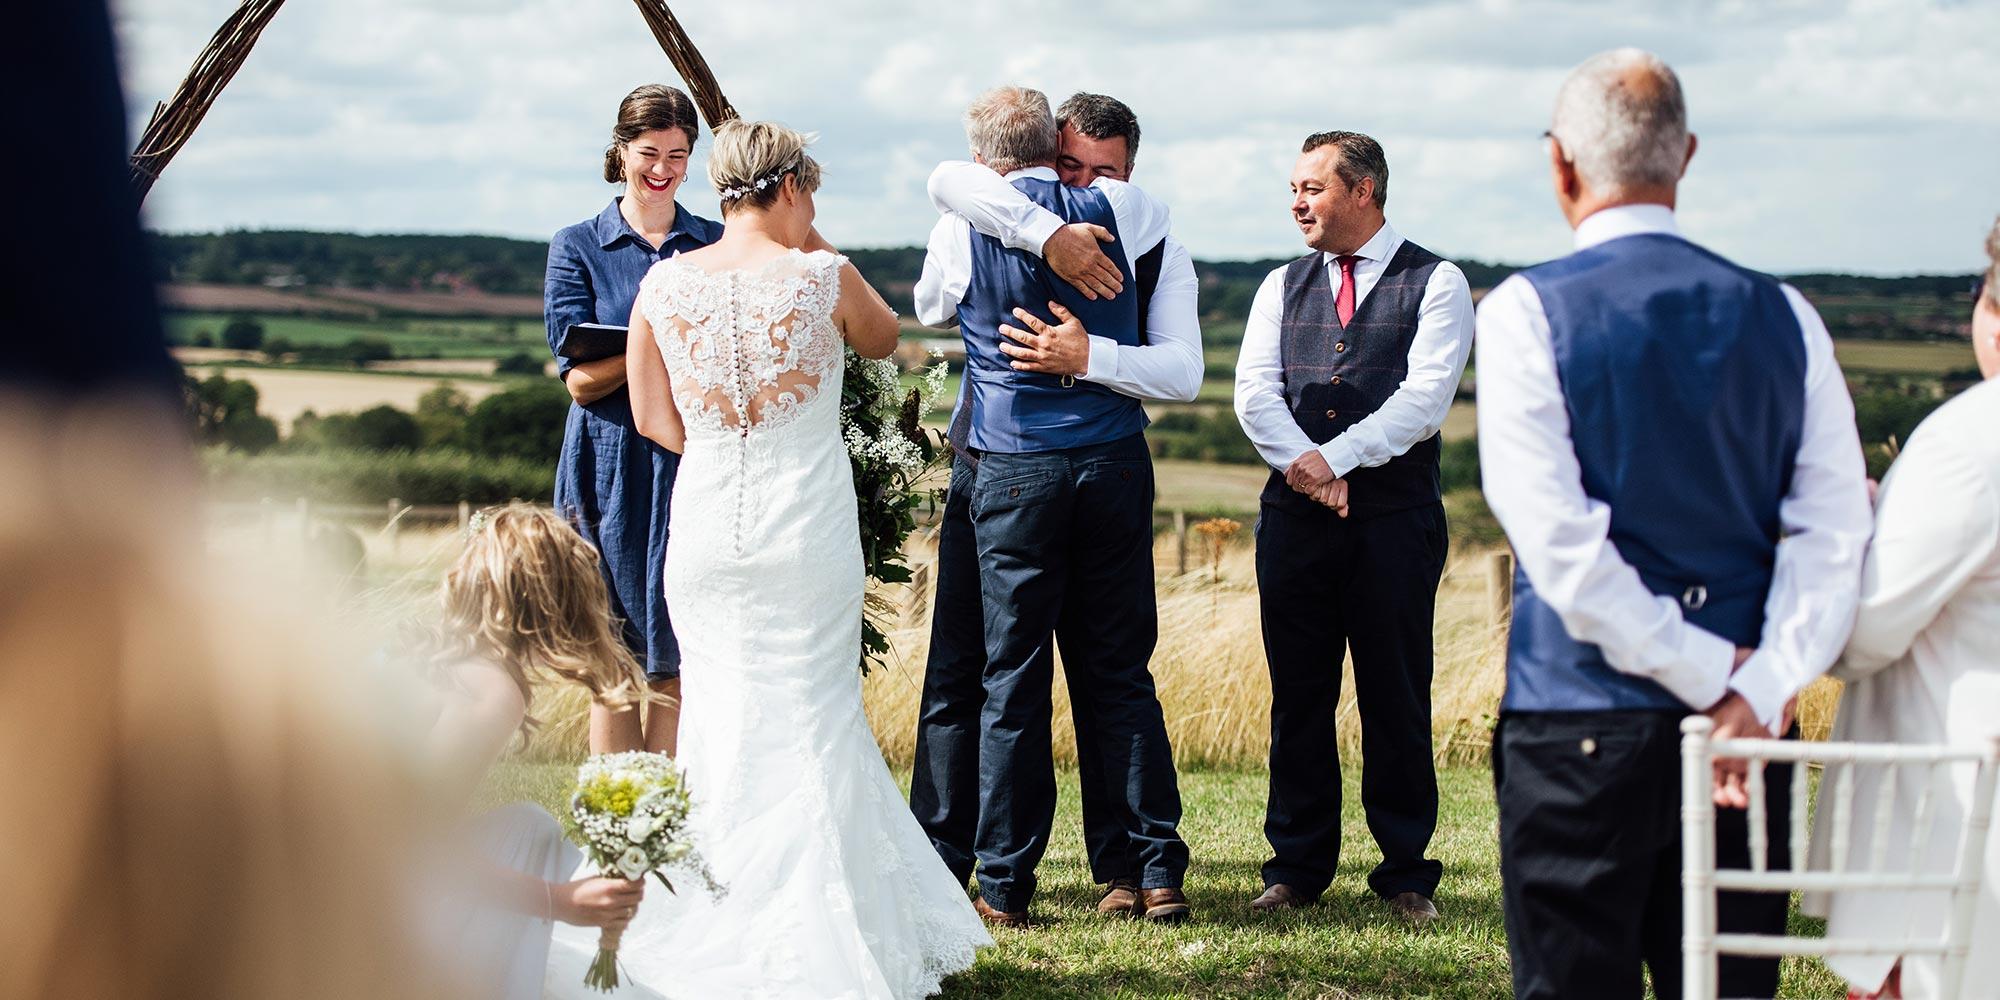 Happy moment during wedding ceremony | Humanist Wedding Celebrant Laura Gimson